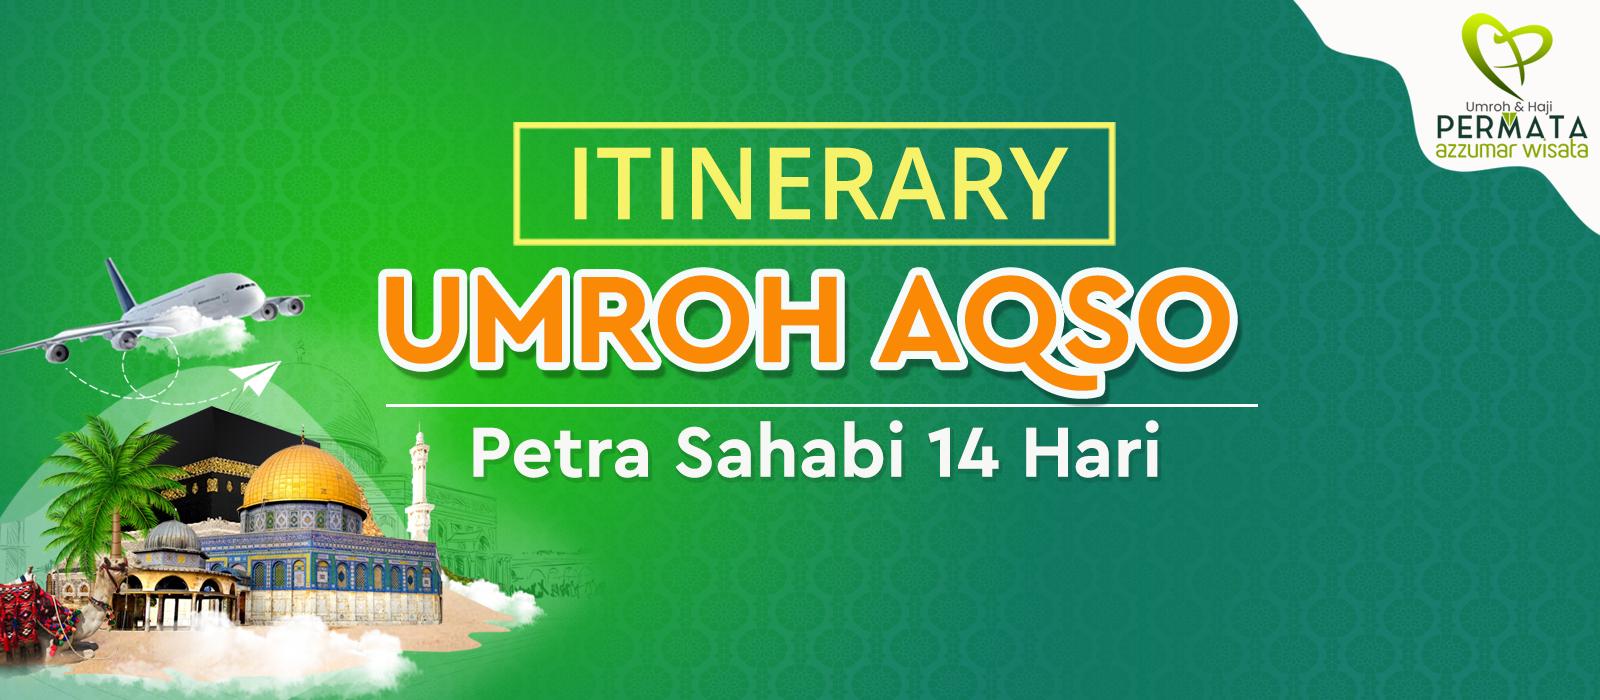 program Umroh plus aqso petra sahabi 14 hari